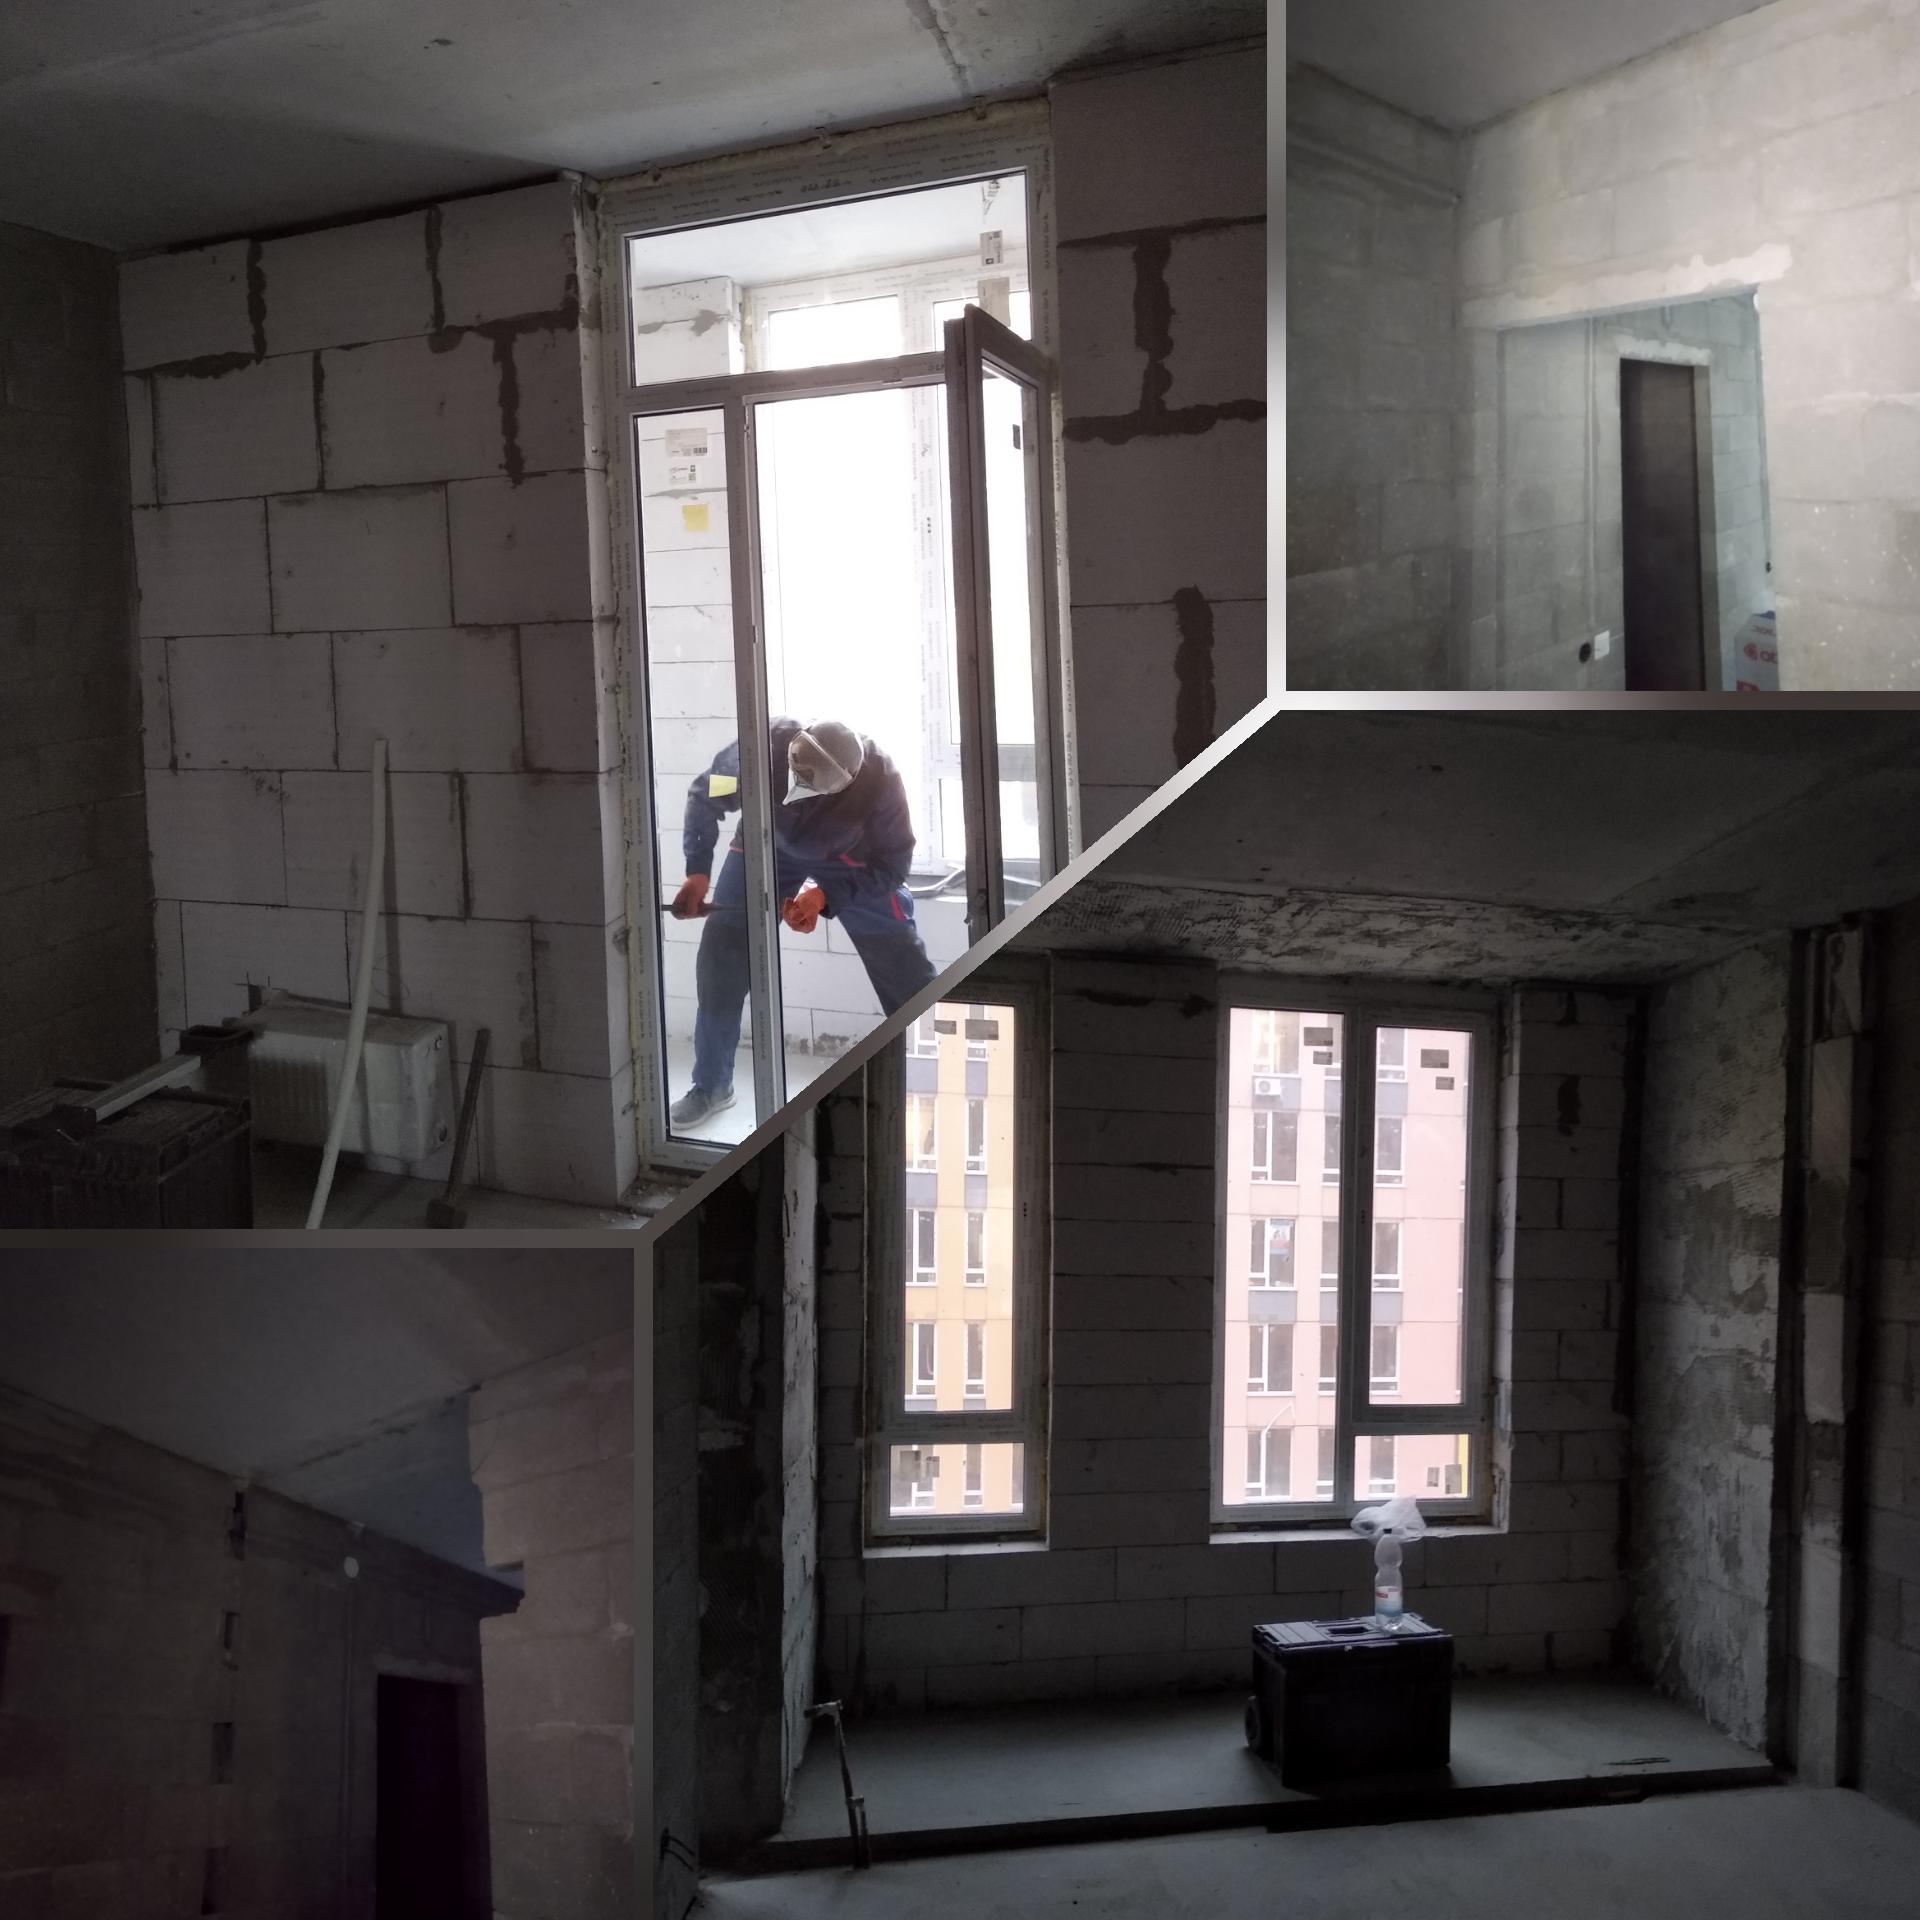 Фото Демонтаж балконного блока, дверного проёма. ЖК Комфорт Таун